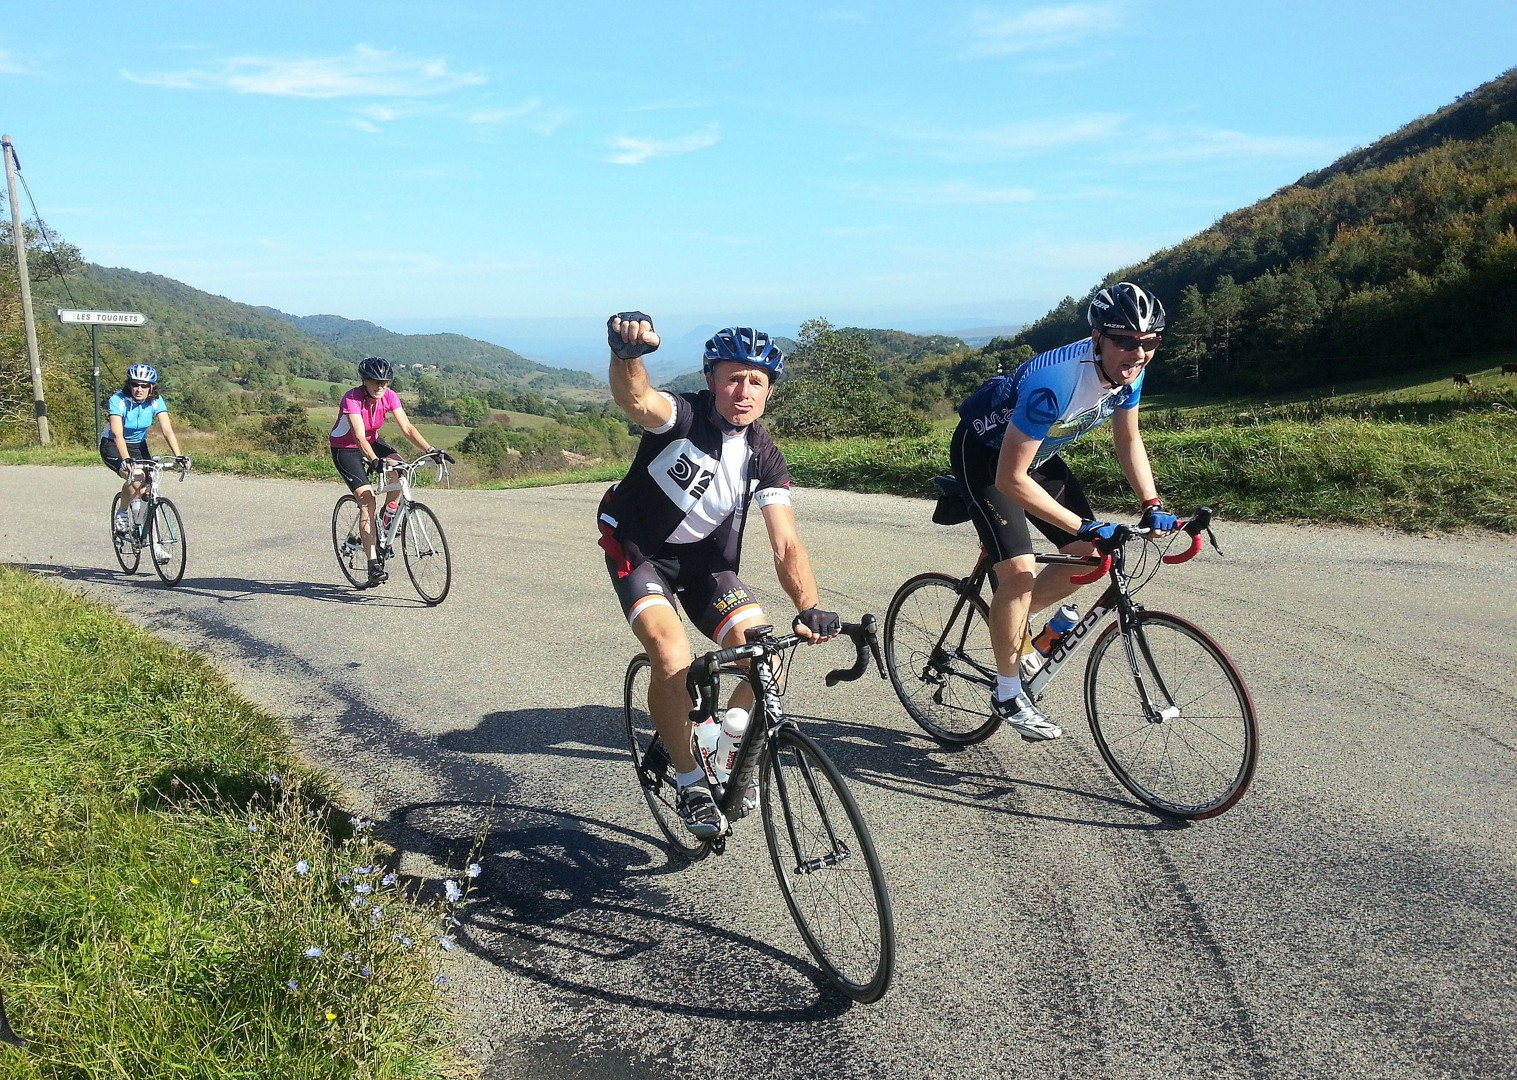 road-cycling-fitness-week-group-cycling.jpg - France - Pyrenees Fitness Week - Guided Road Cycling Holiday (Grade 3-4) - Road Cycling